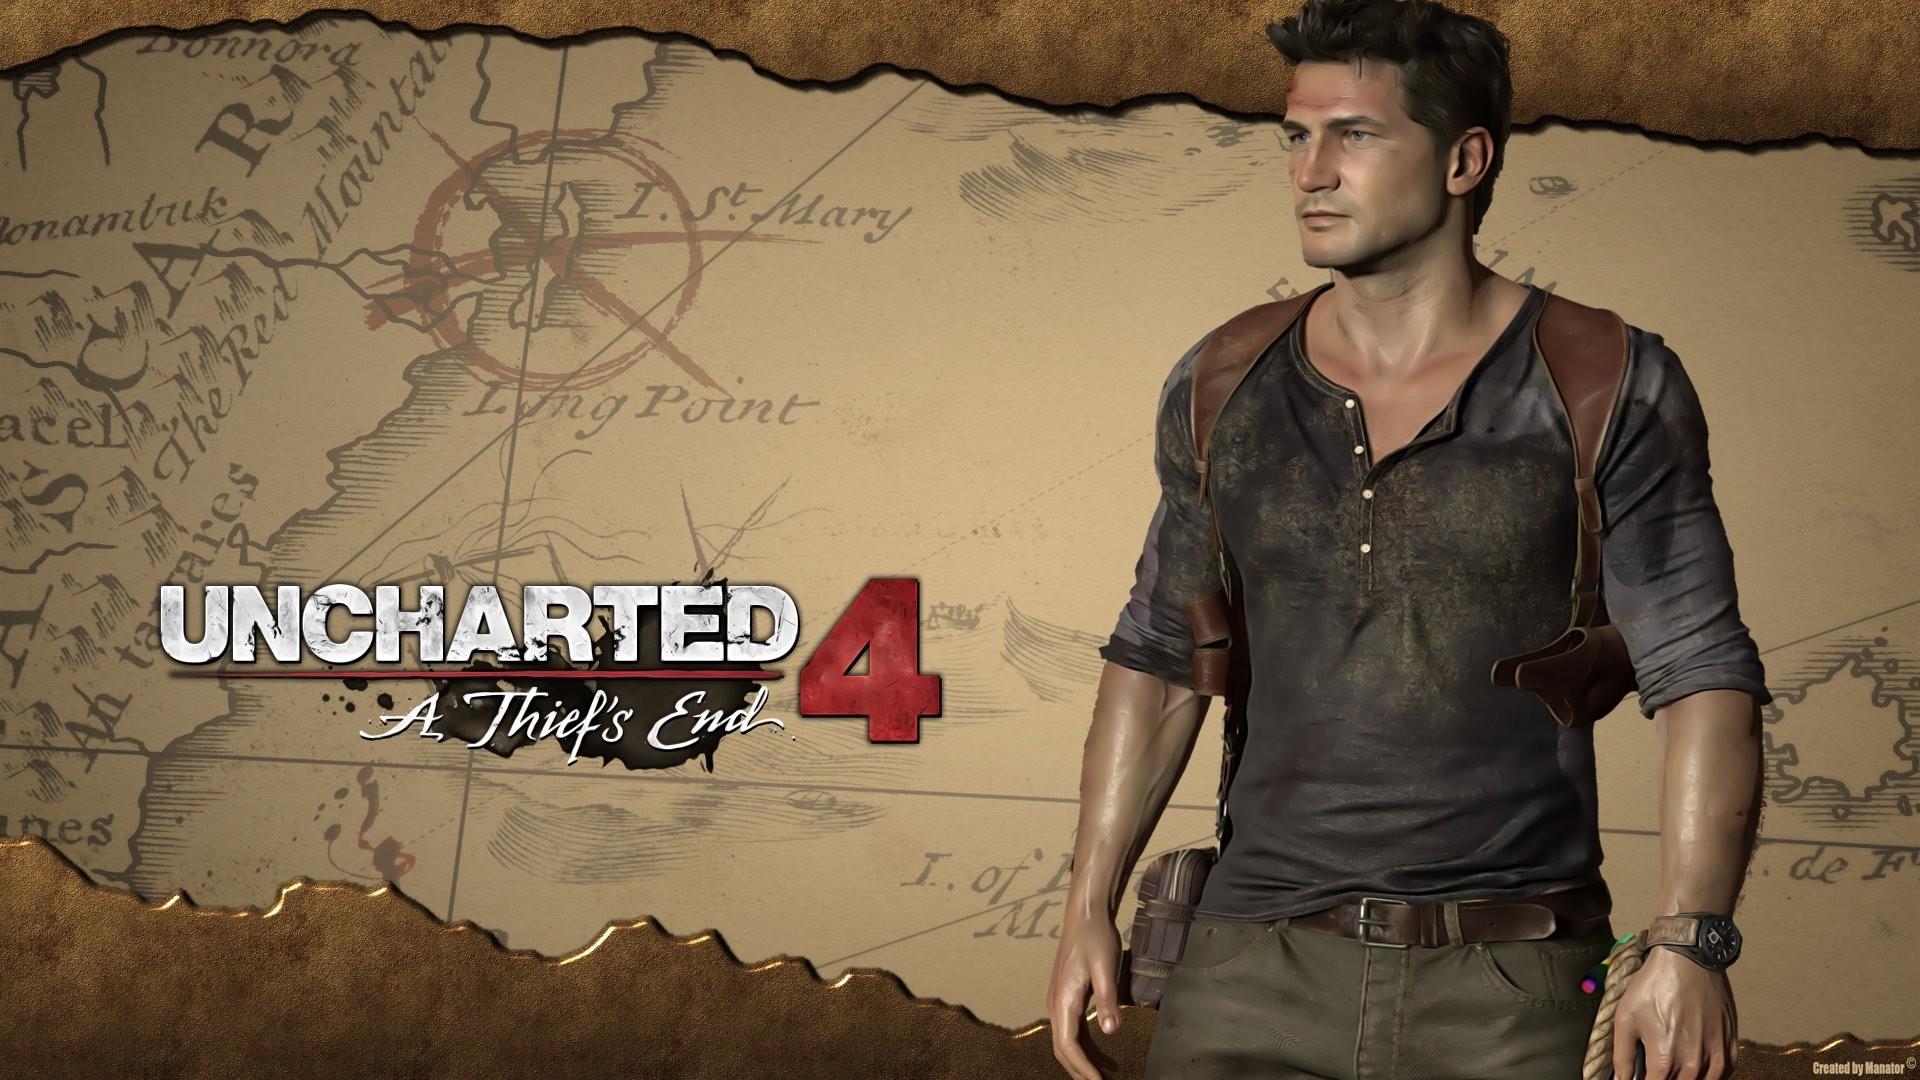 UNCHARTED 4 THIEFS END action adventure tps shooter platform poster  wallpaper | | 745711 | WallpaperUP